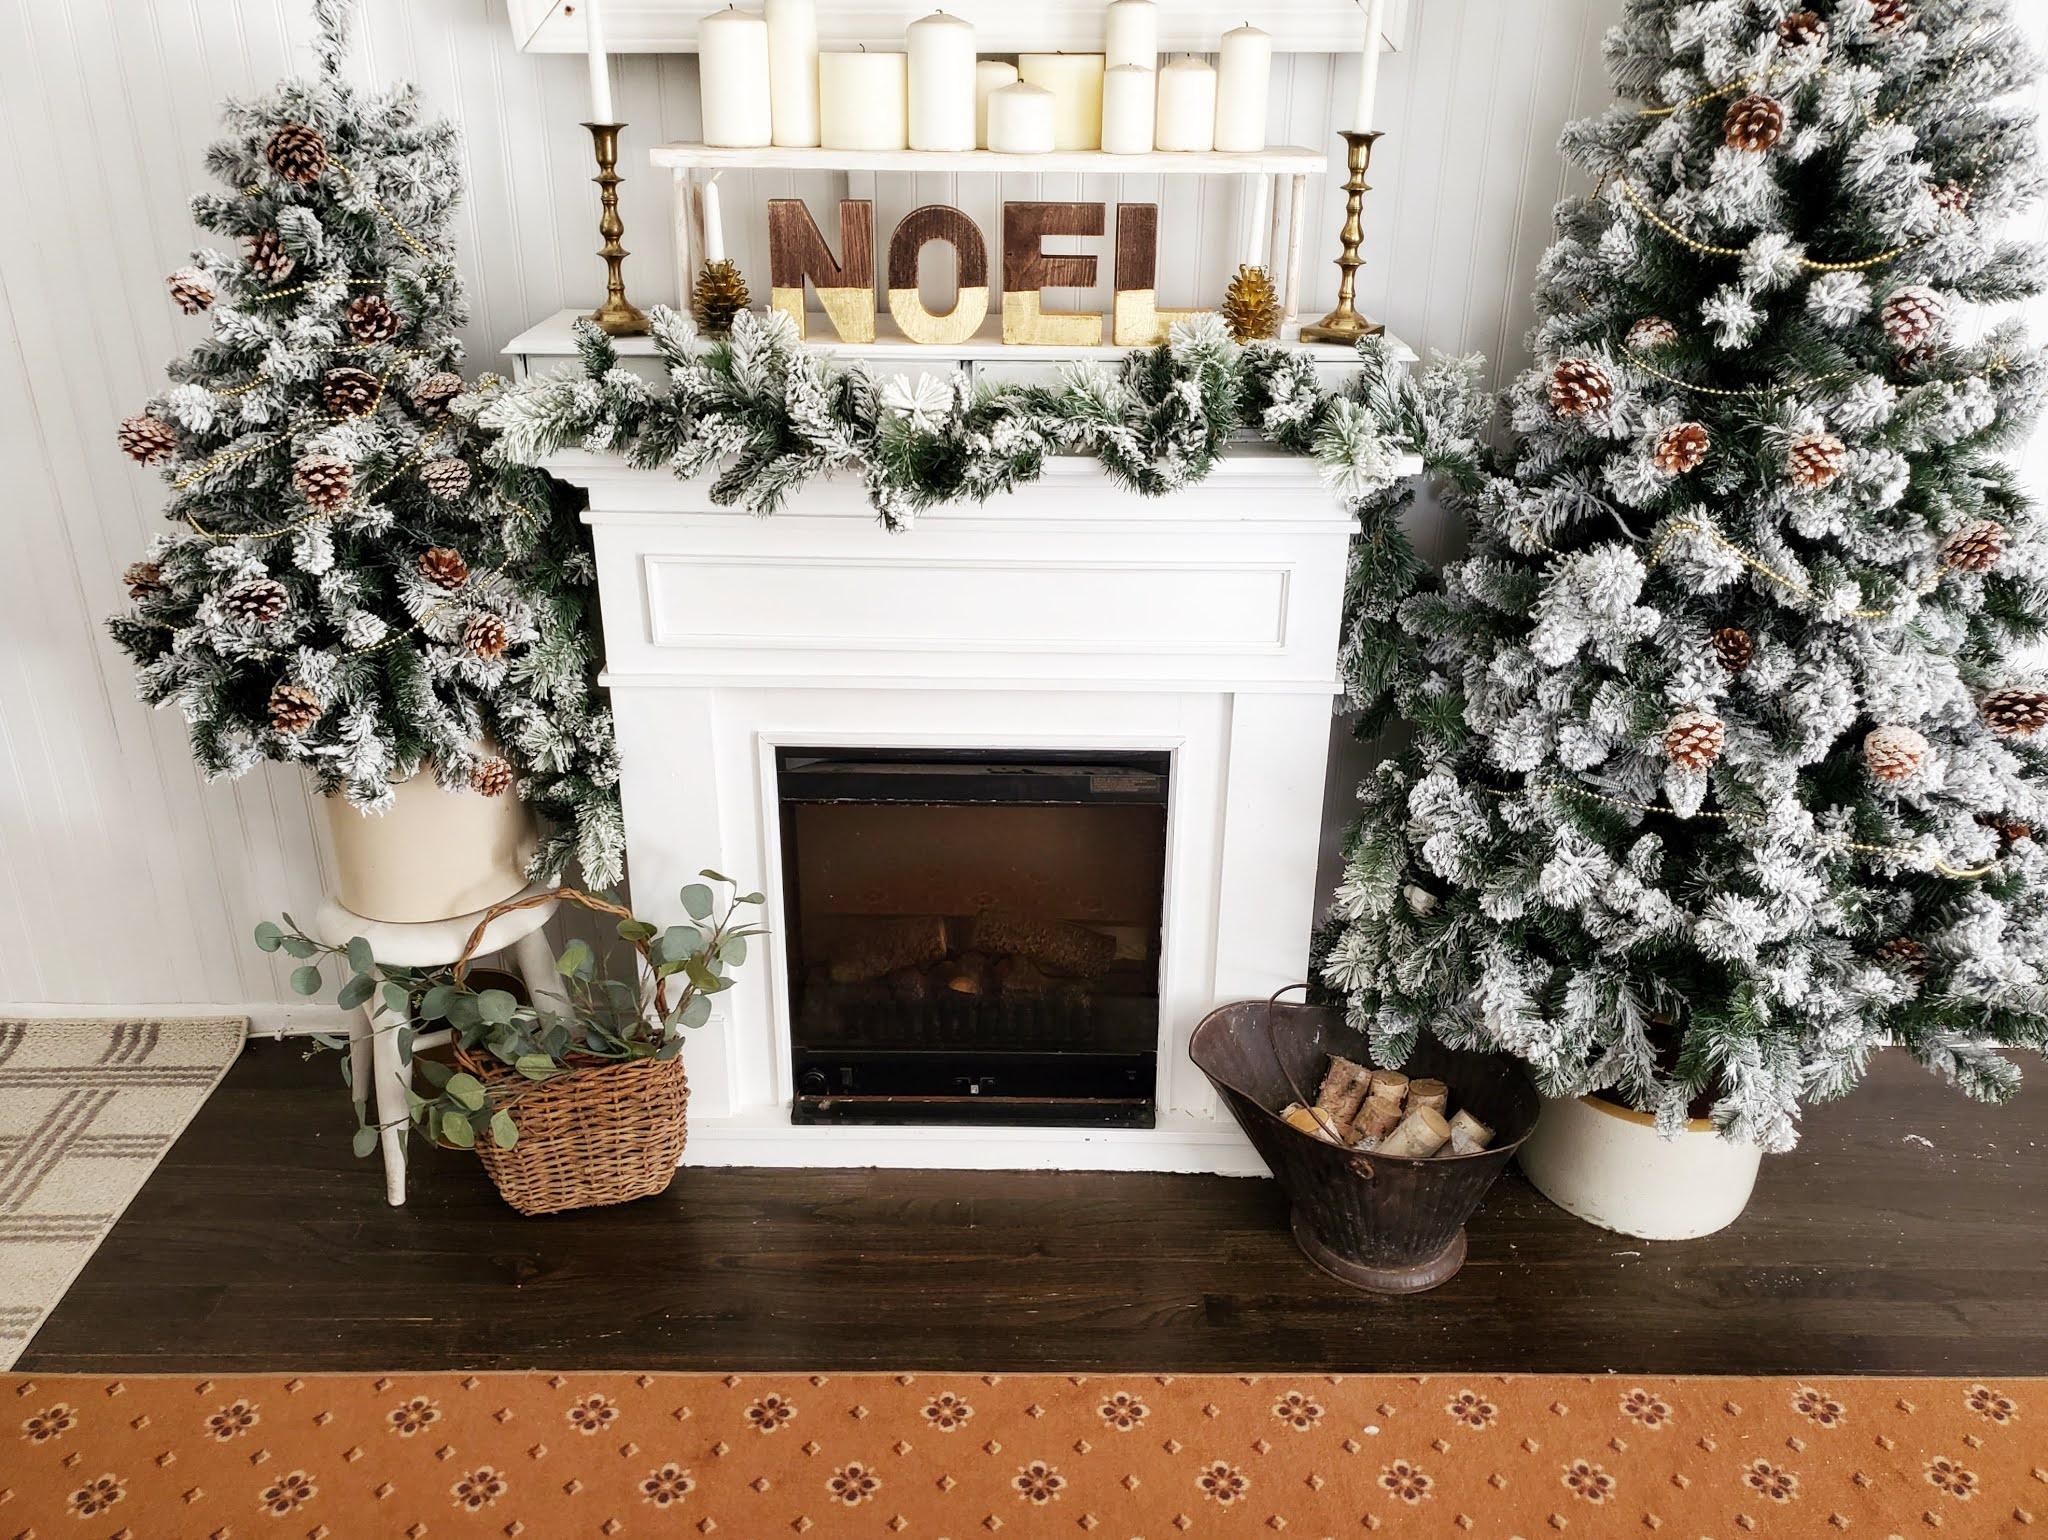 2020 Christmas Table Stting Ideas The Quaint Sanctuary